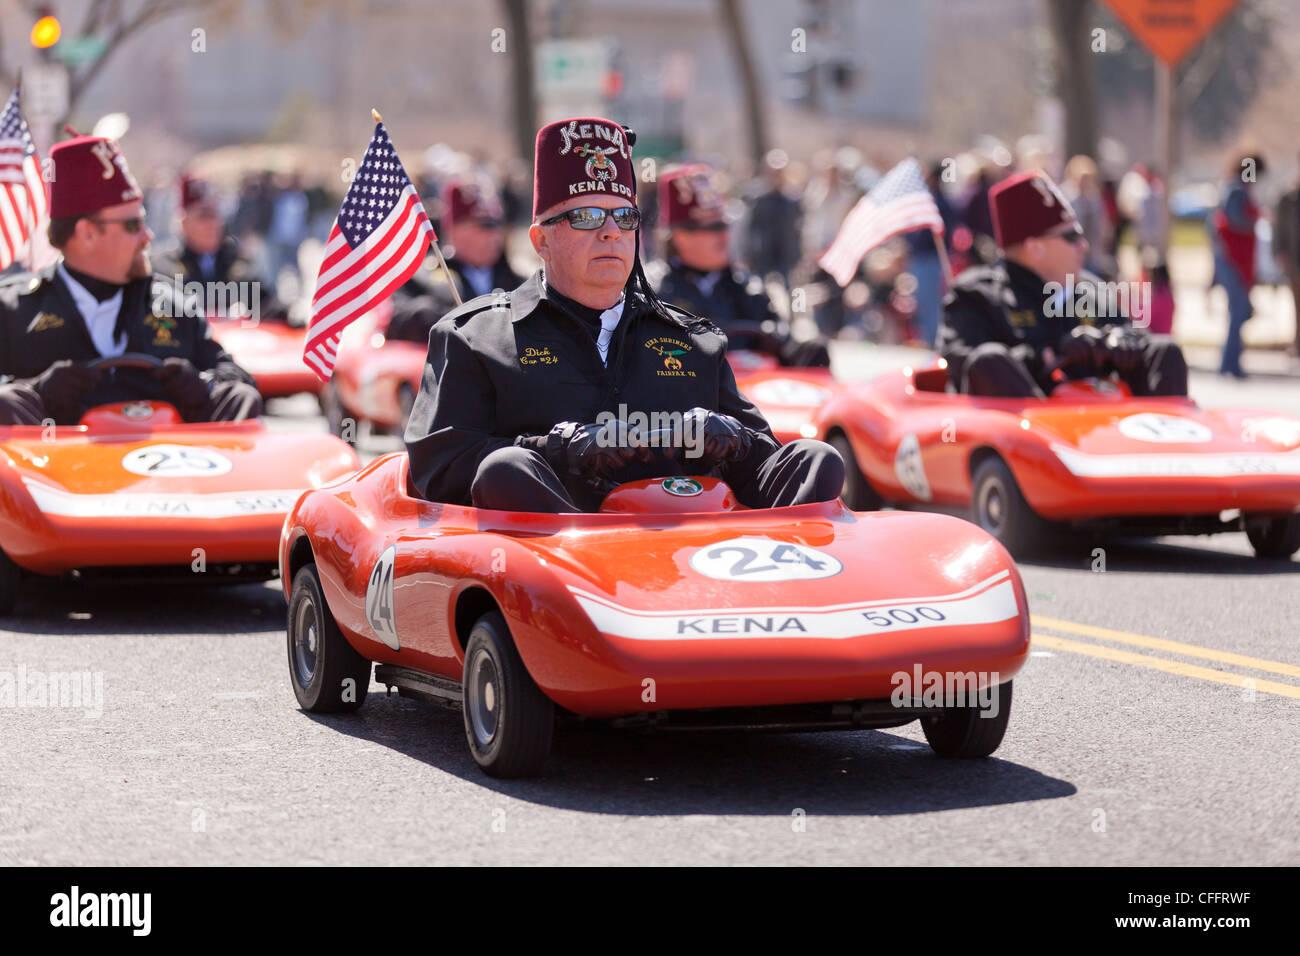 Mini Corvettes driven by Kena 500 members of Fairfax, Virginia - Stock Image